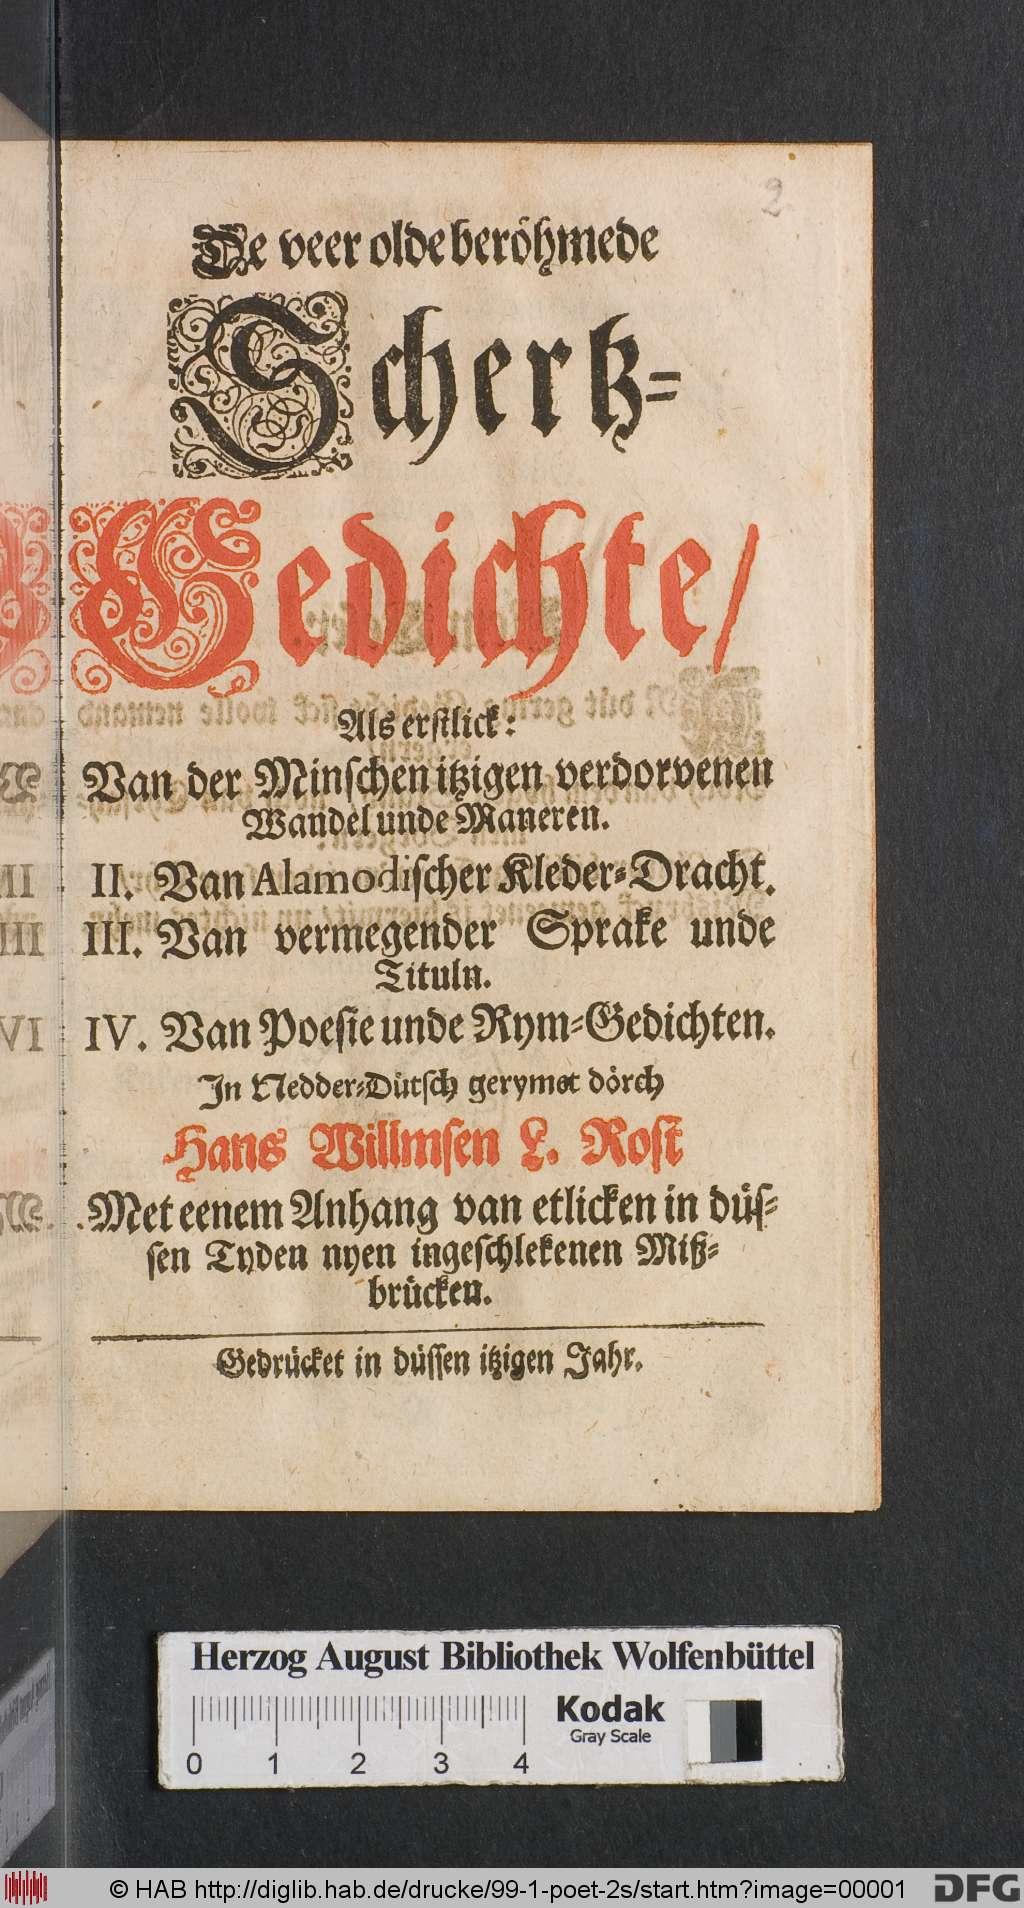 http://diglib.hab.de/drucke/99-1-poet-2s/00001.jpg